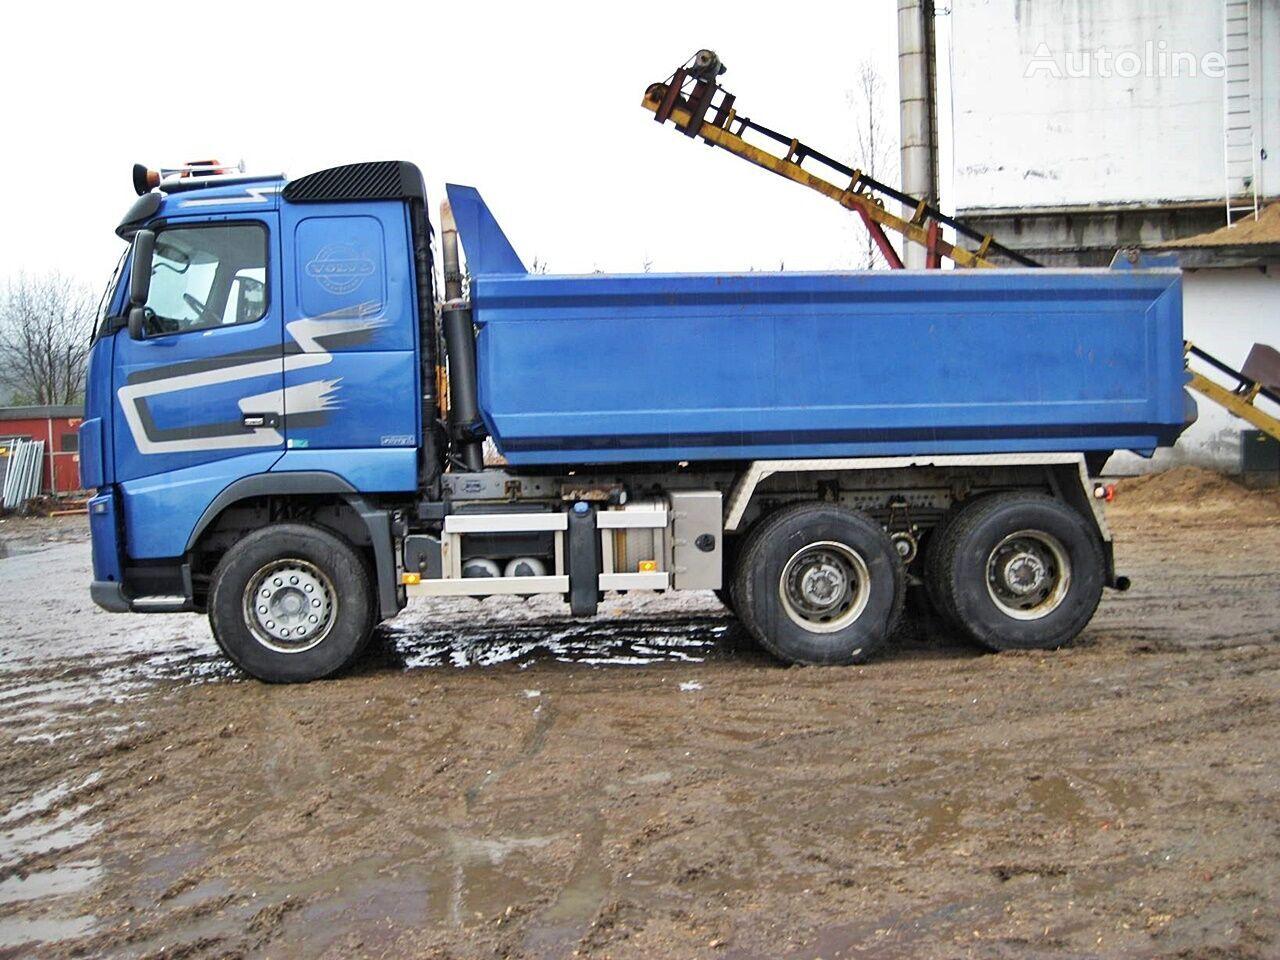 VOLVO FH16 600 6x4*Kipper*Retarder*Manual*Euro 5 dump truck